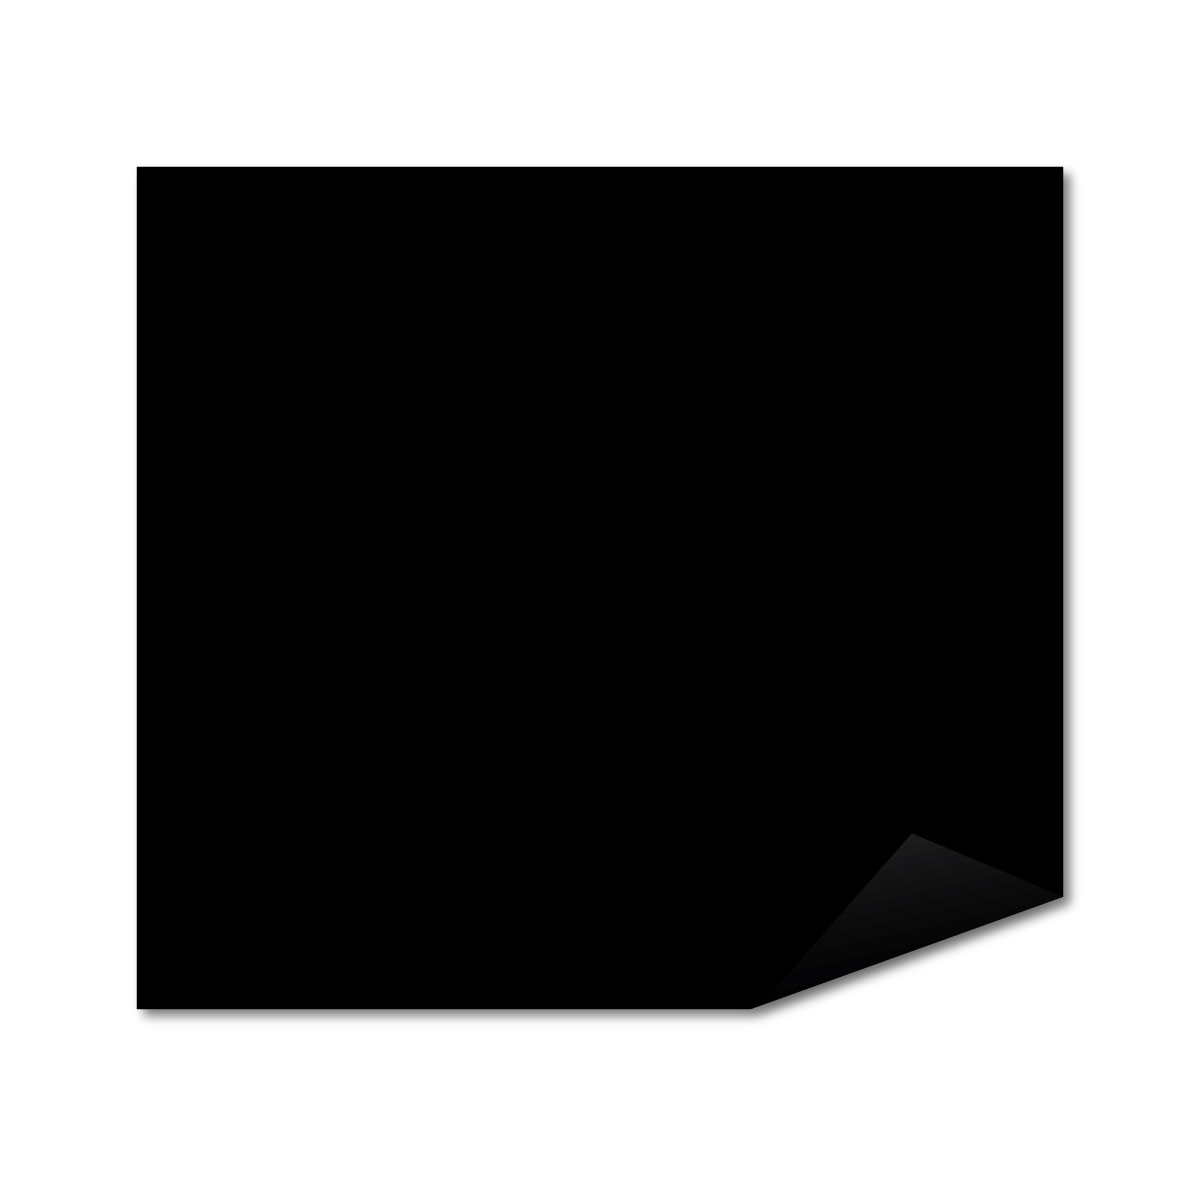 pvb 038mm vanceva absolute black interleaved 2460mm